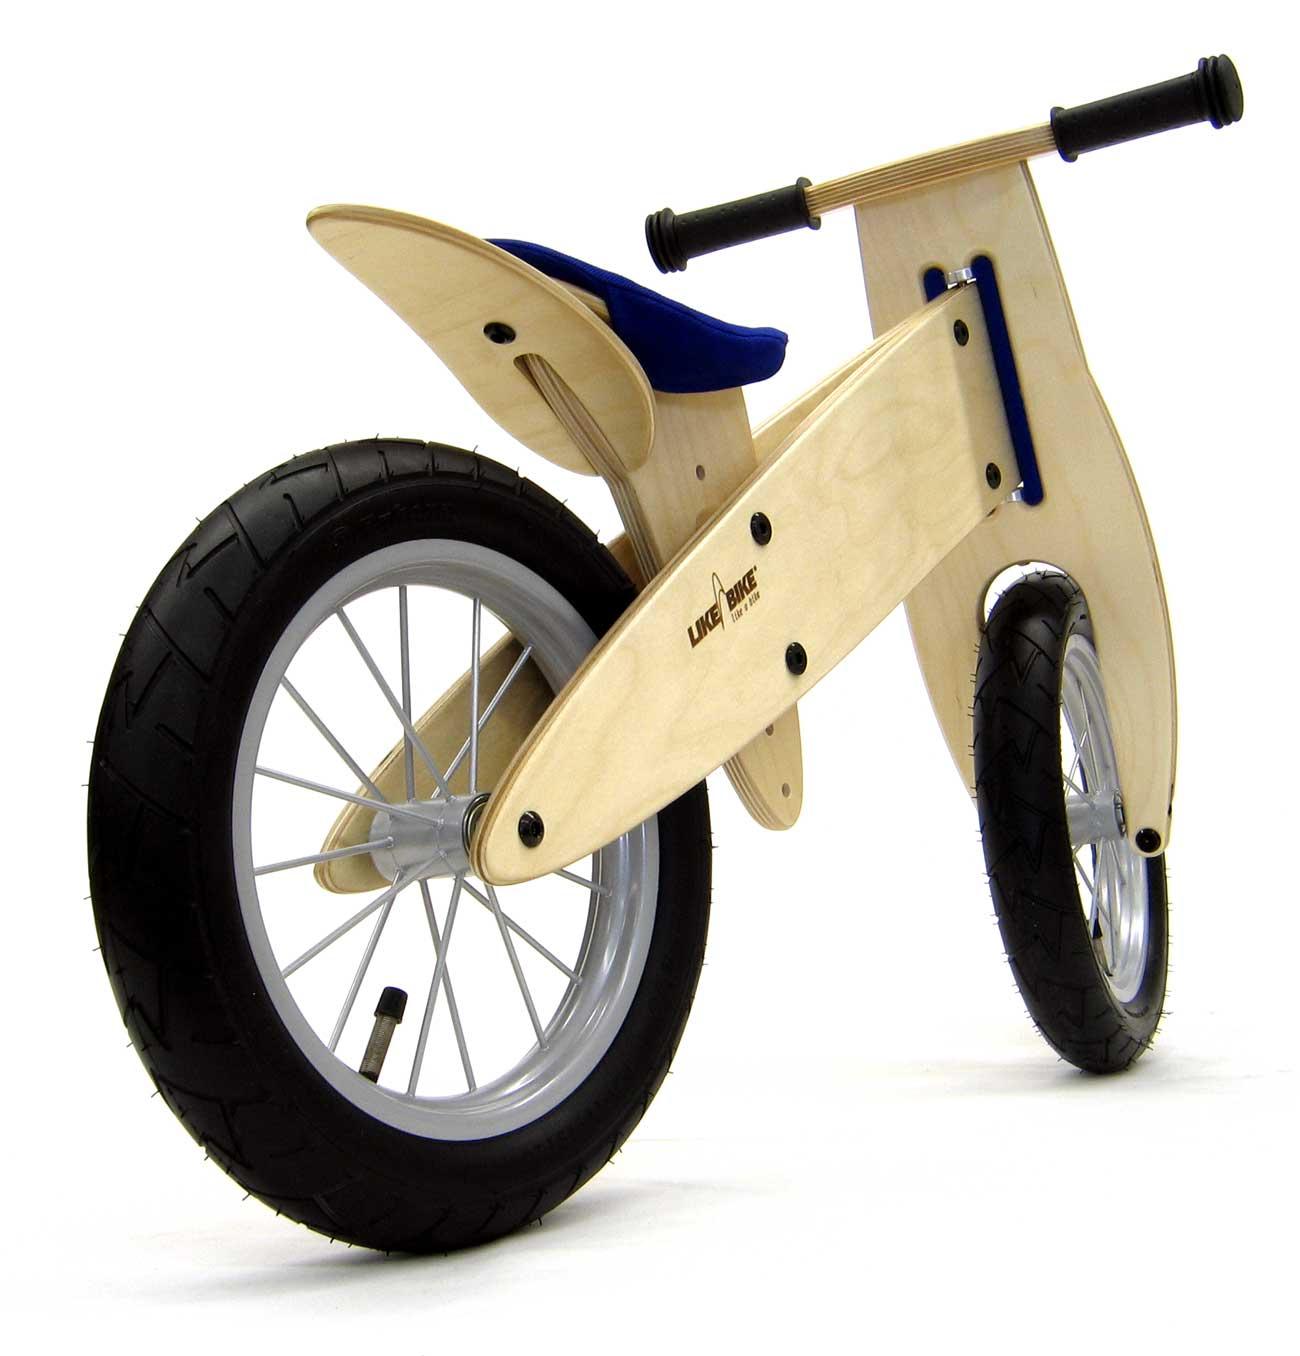 Kokua LIKEaBIKE spoky, leichtes Laufrad  mit blauem Sattel